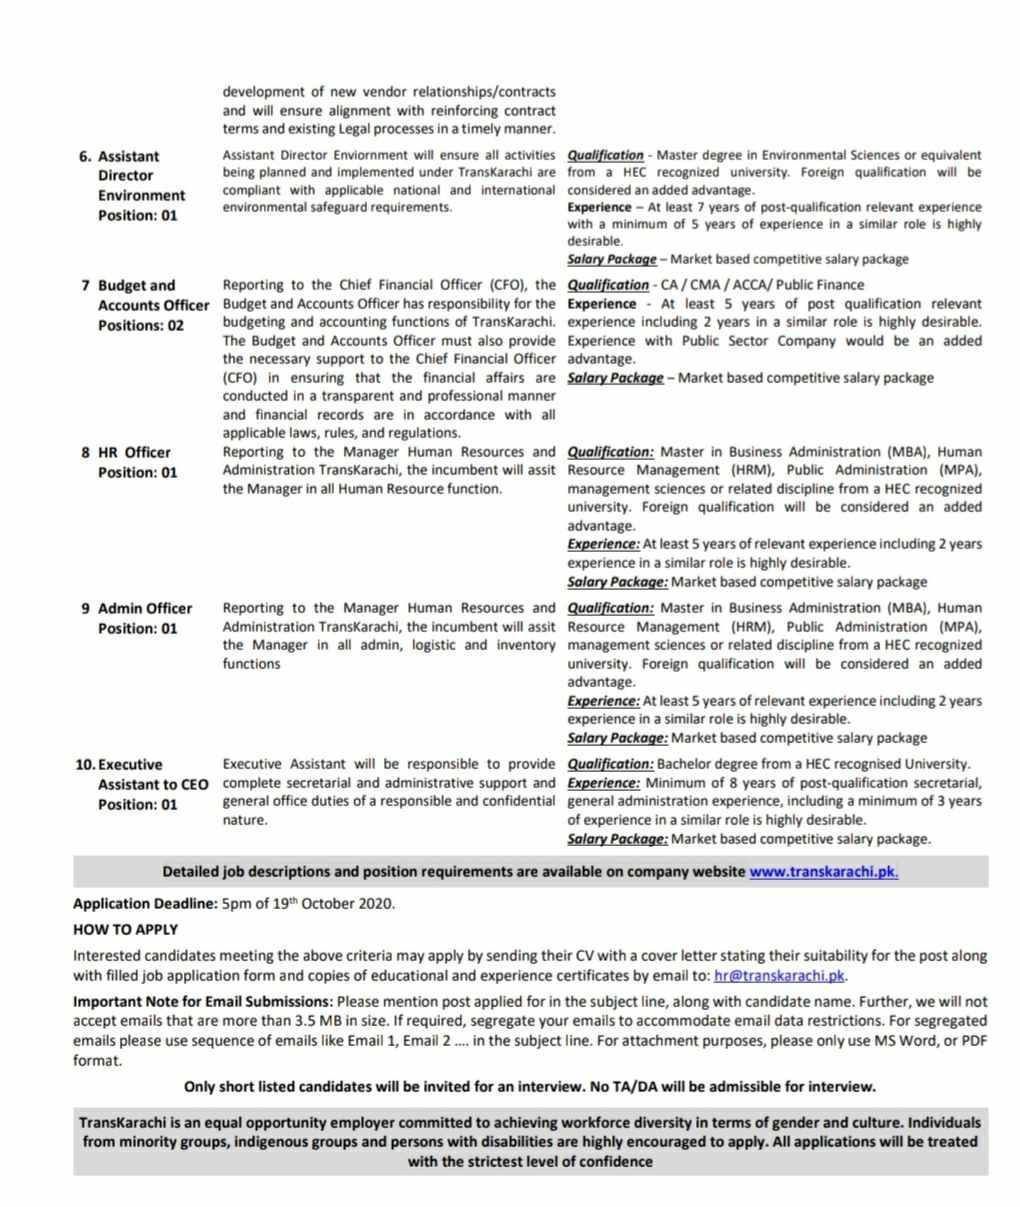 TransKarachi Operator of the Karachi Breeze System Jobs 2020 | Public Sector